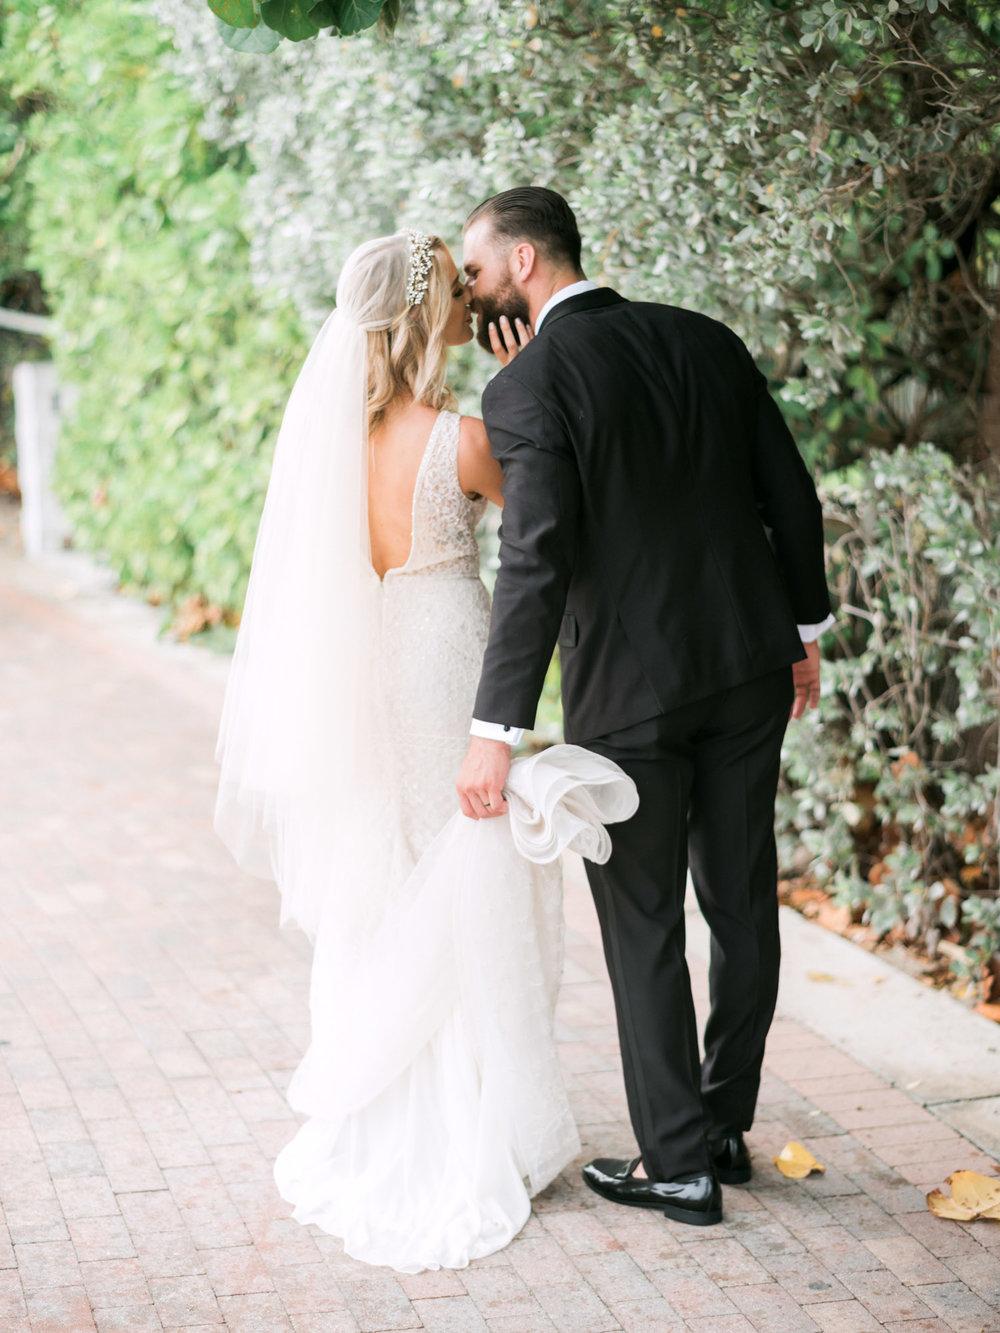 raleigh-miami-beach-destination-film-wedding-1181.jpg